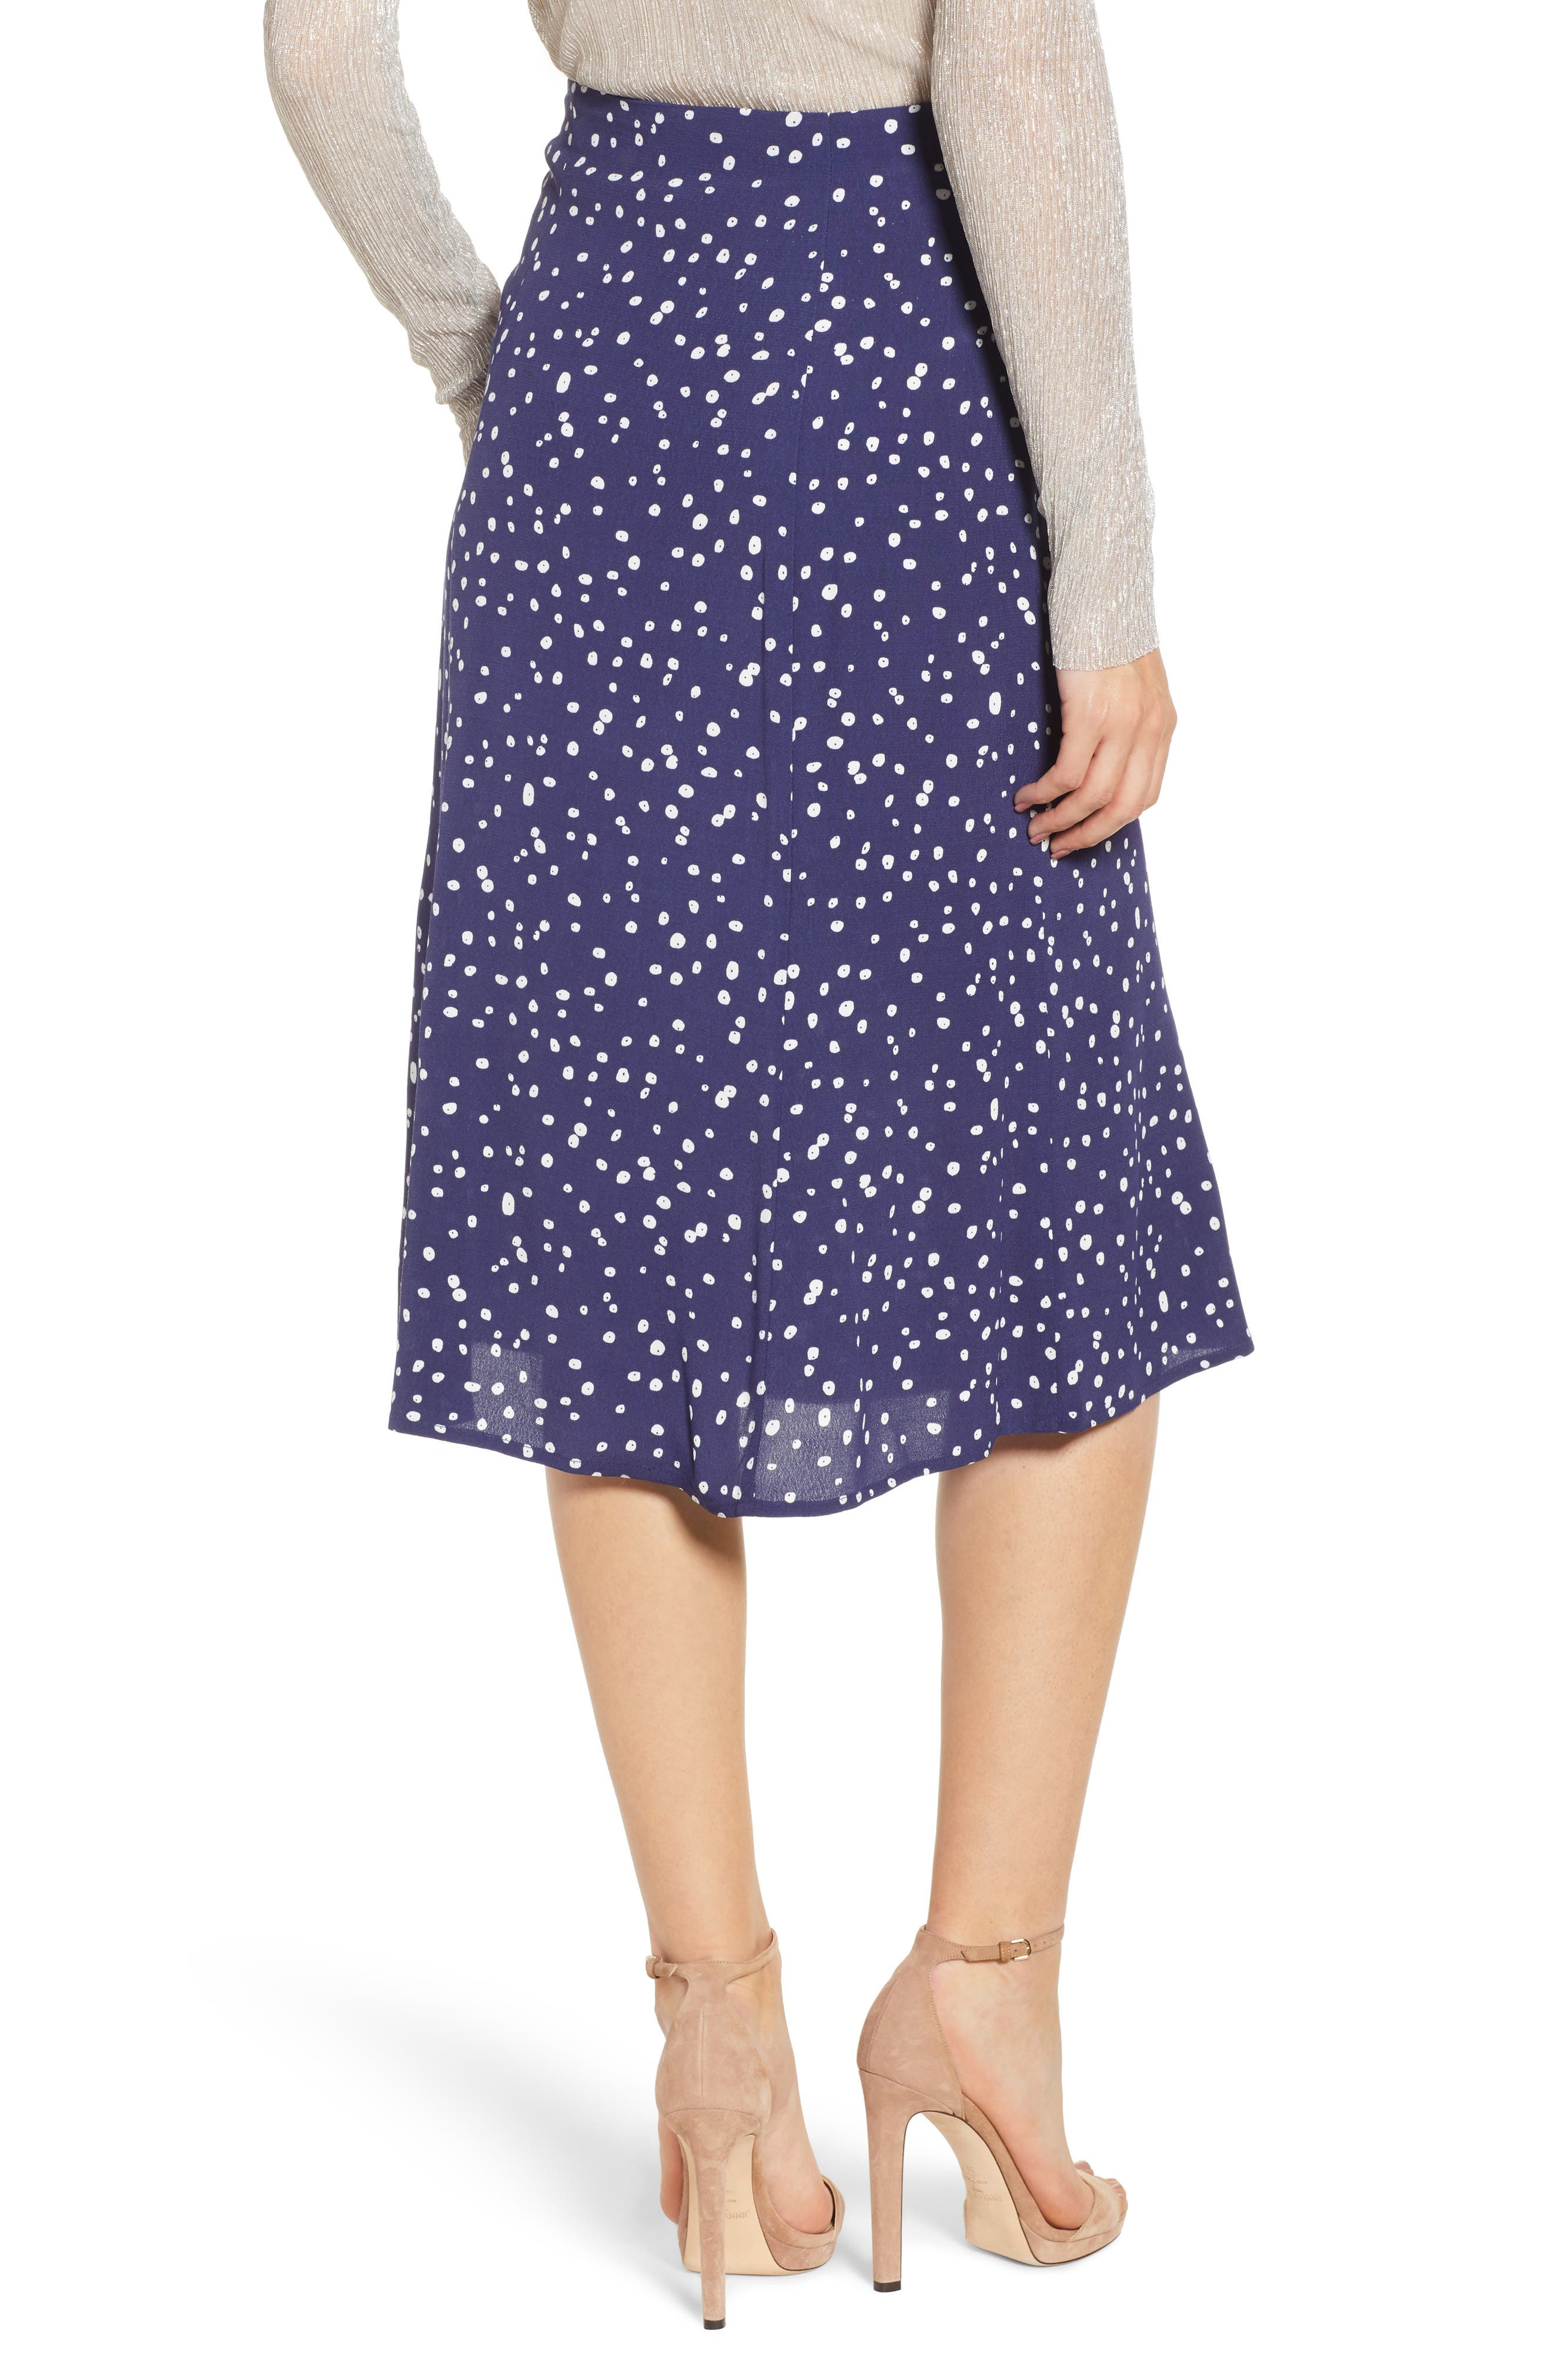 LEITH,                             High Waist Print Midi Skirt,                             Alternate thumbnail 2, color,                             NAVY PEACOAT BUTTON DOTS